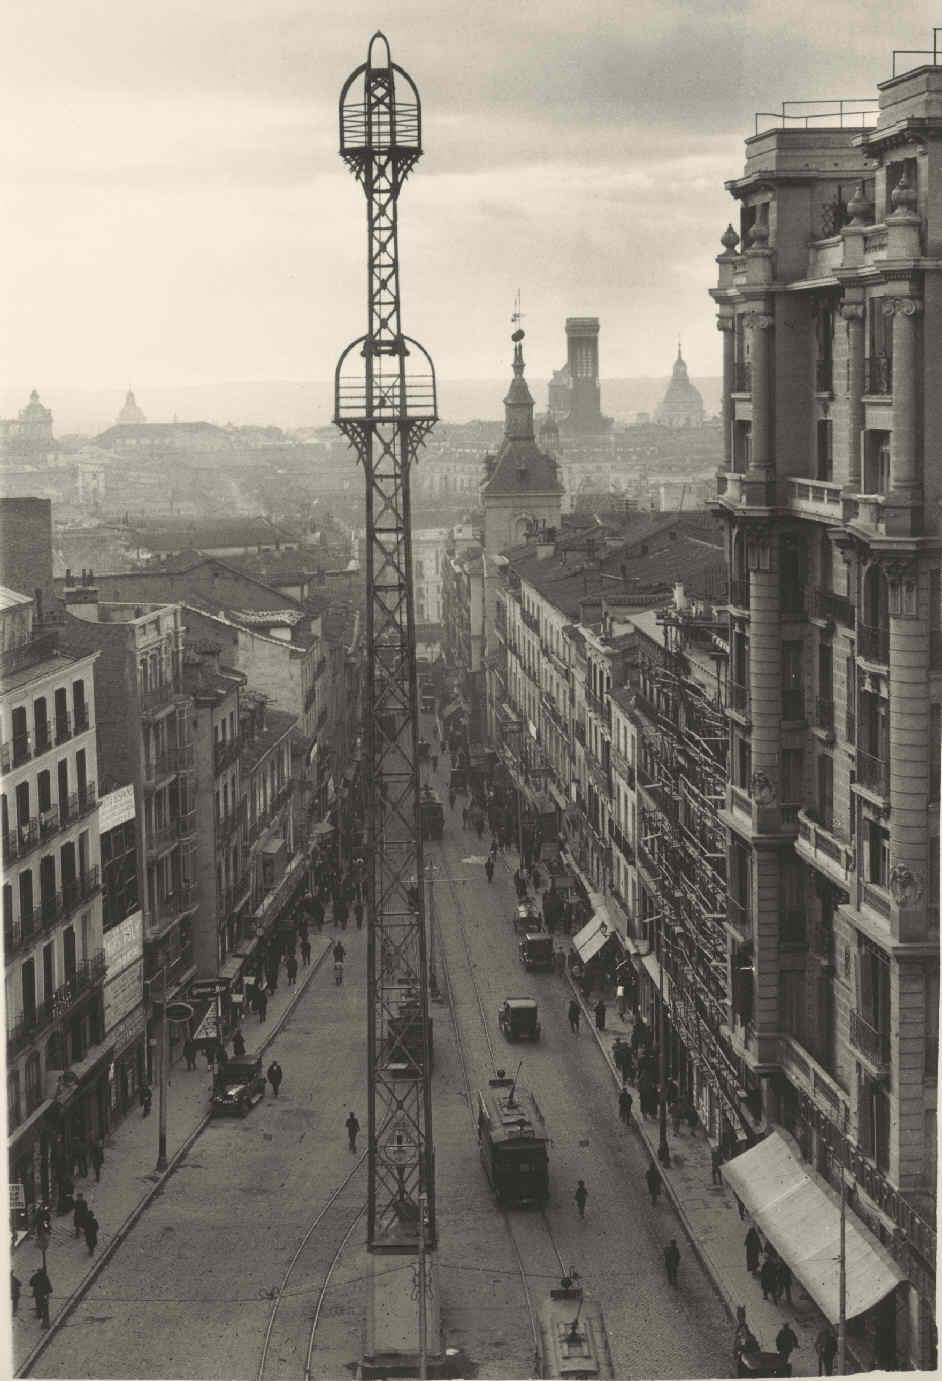 Archivo Fotografico Fundacion Telefonica Espana Part 27